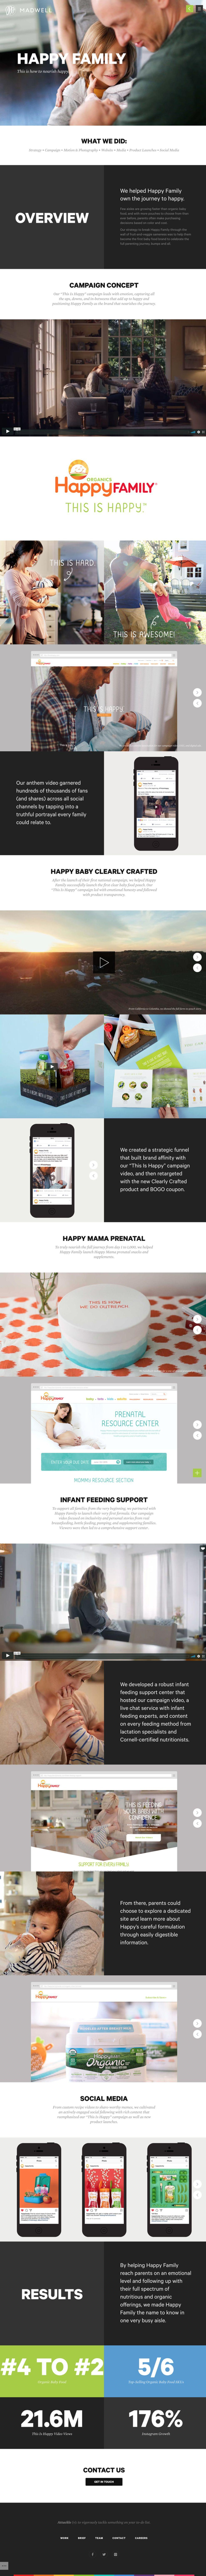 Madwell Beautiful Website Design